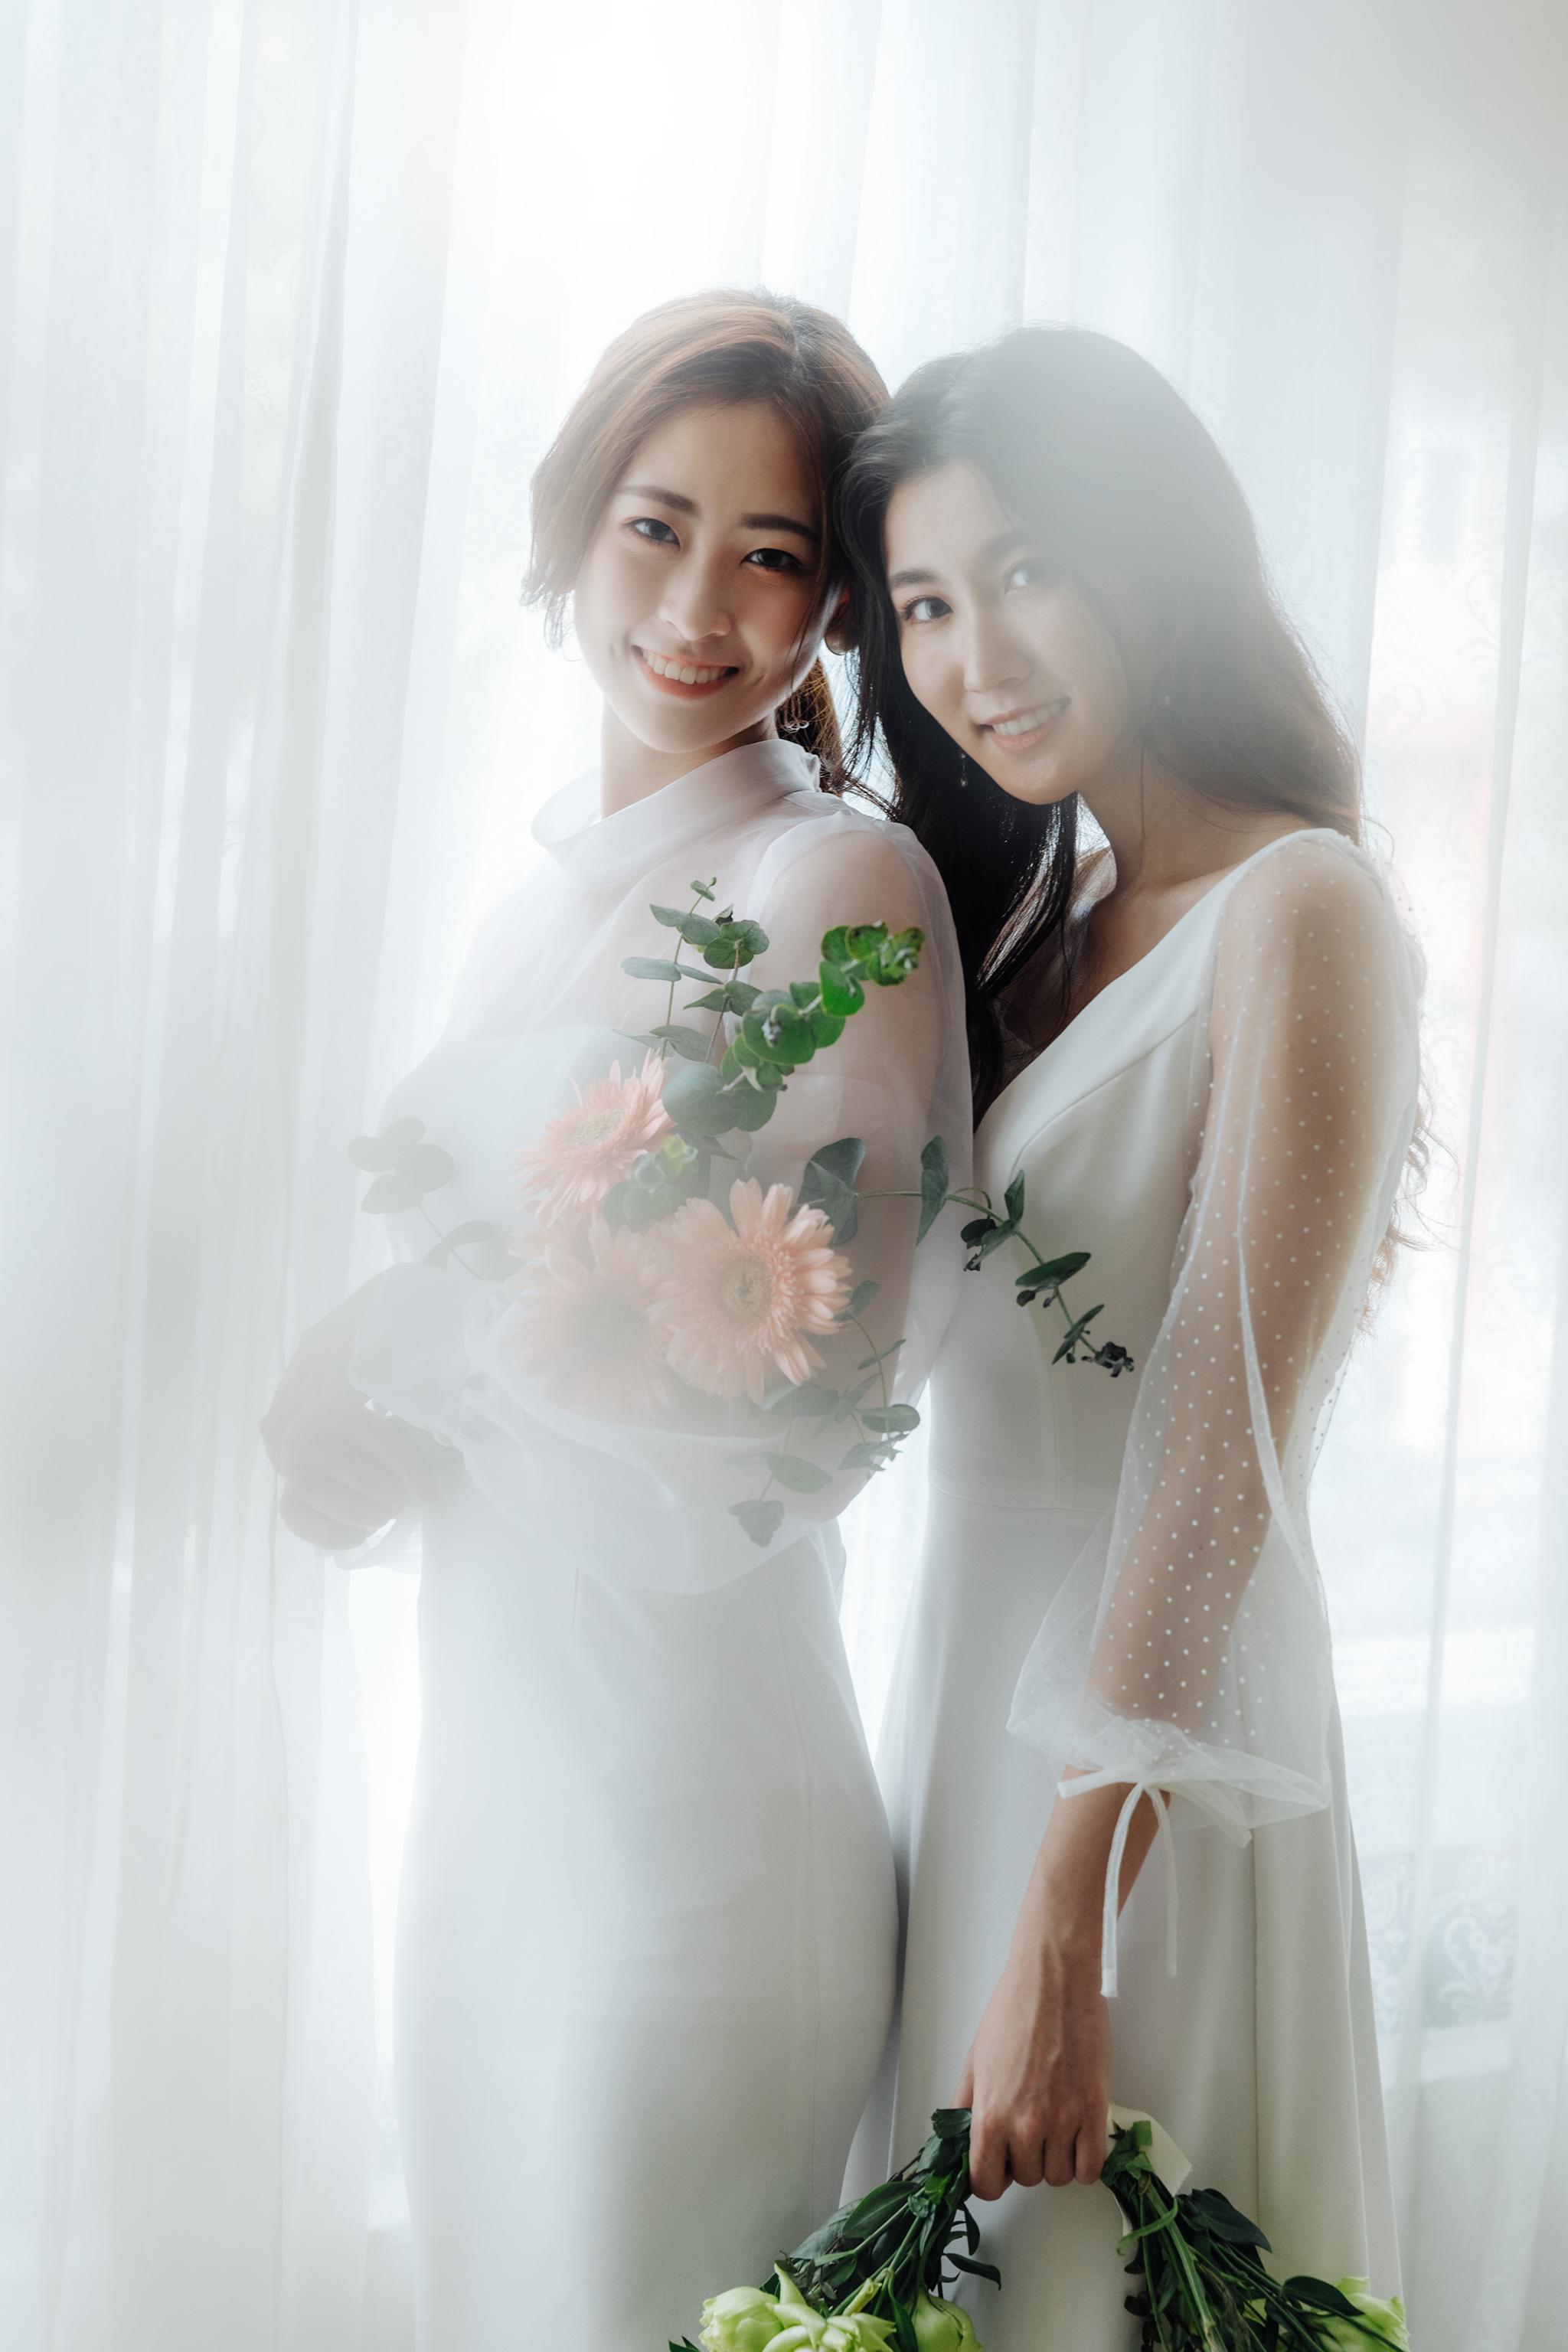 49929557912 da14ac0bee o - 【閨蜜婚紗】+Jessy & Tiffany+